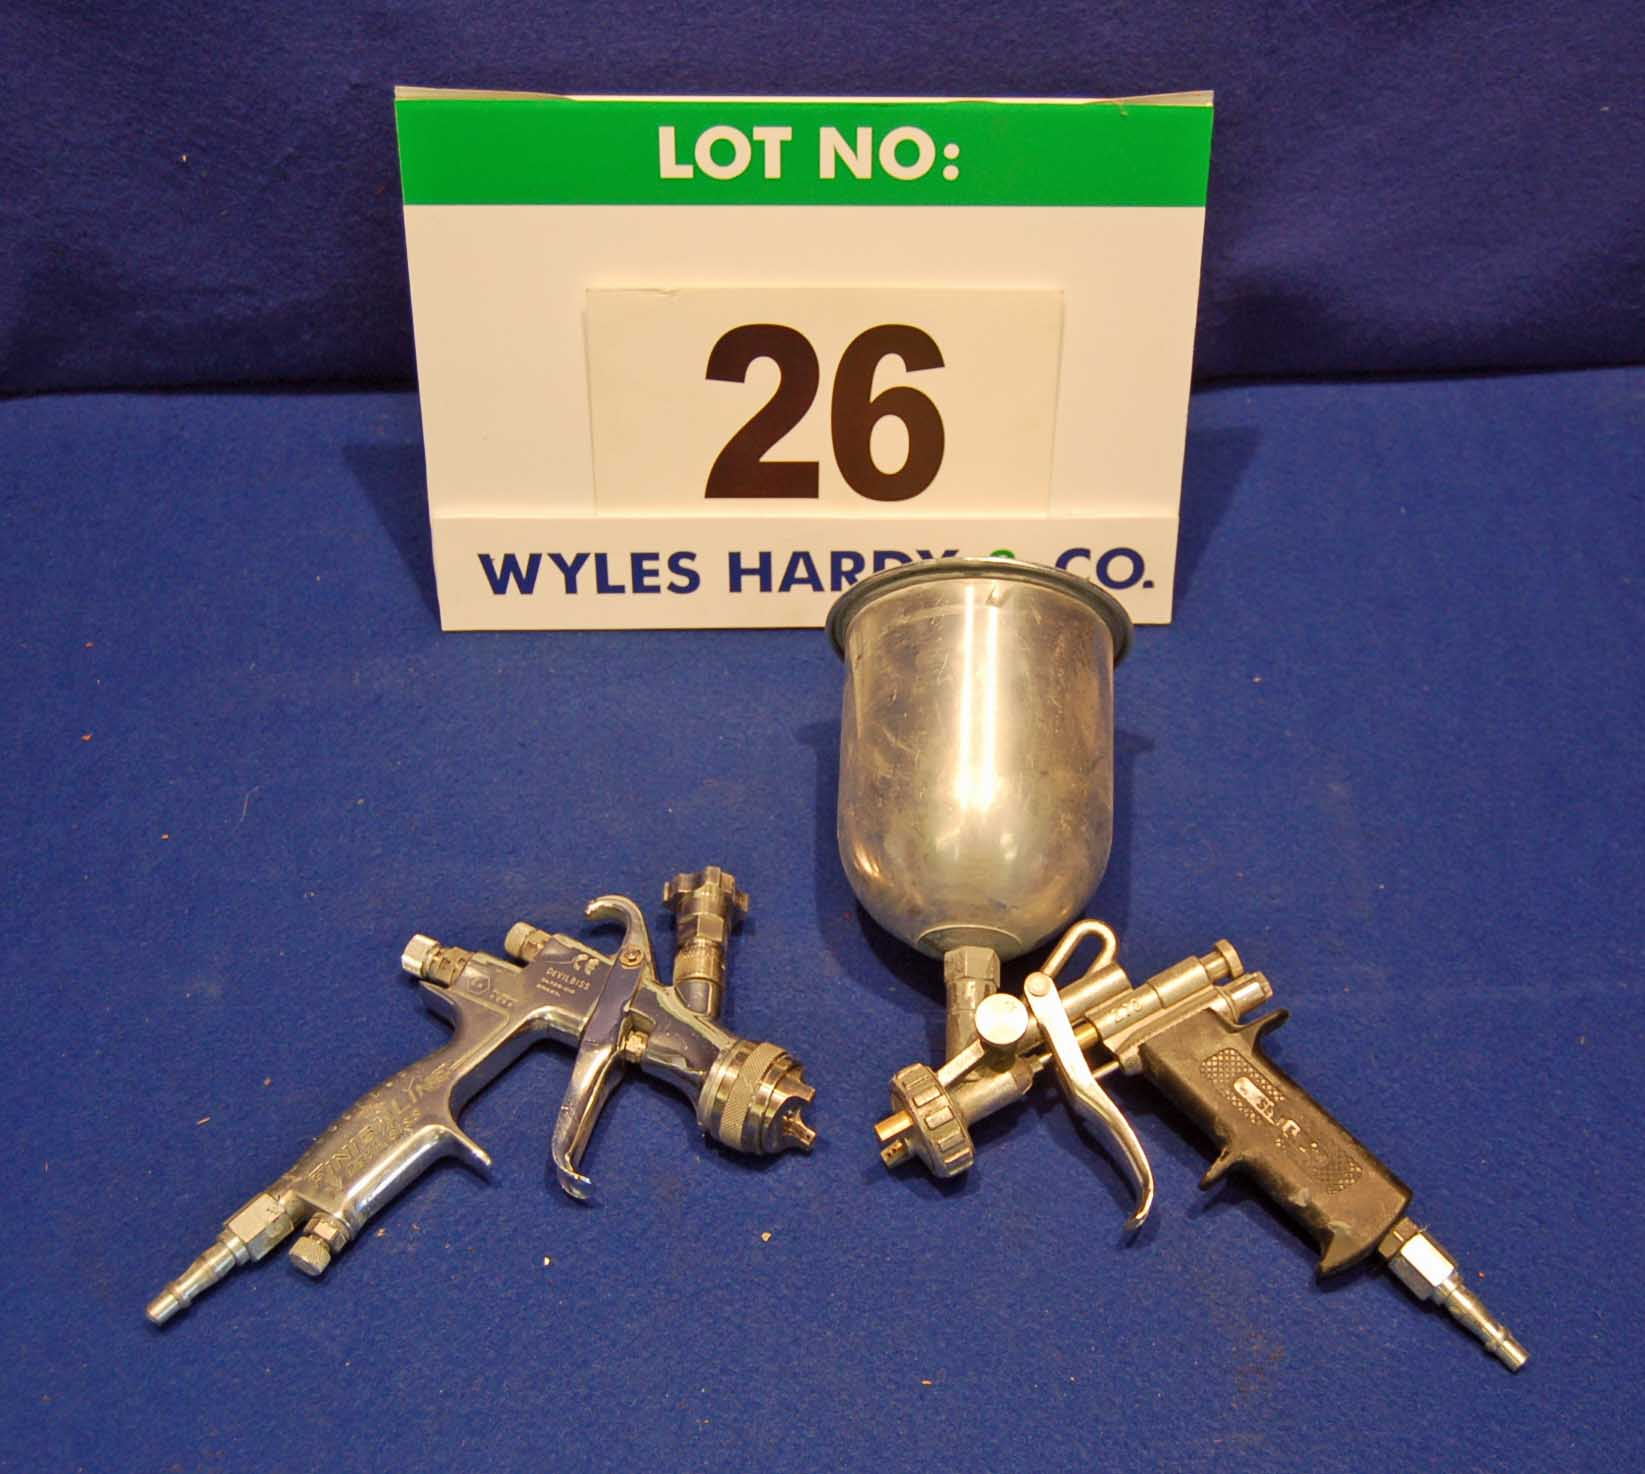 Lot 26 - A DEVILBISS Finishline Gravity Feed Spray Gun and A SEALEY Gravity Feed Spray Gun with Paint Pot